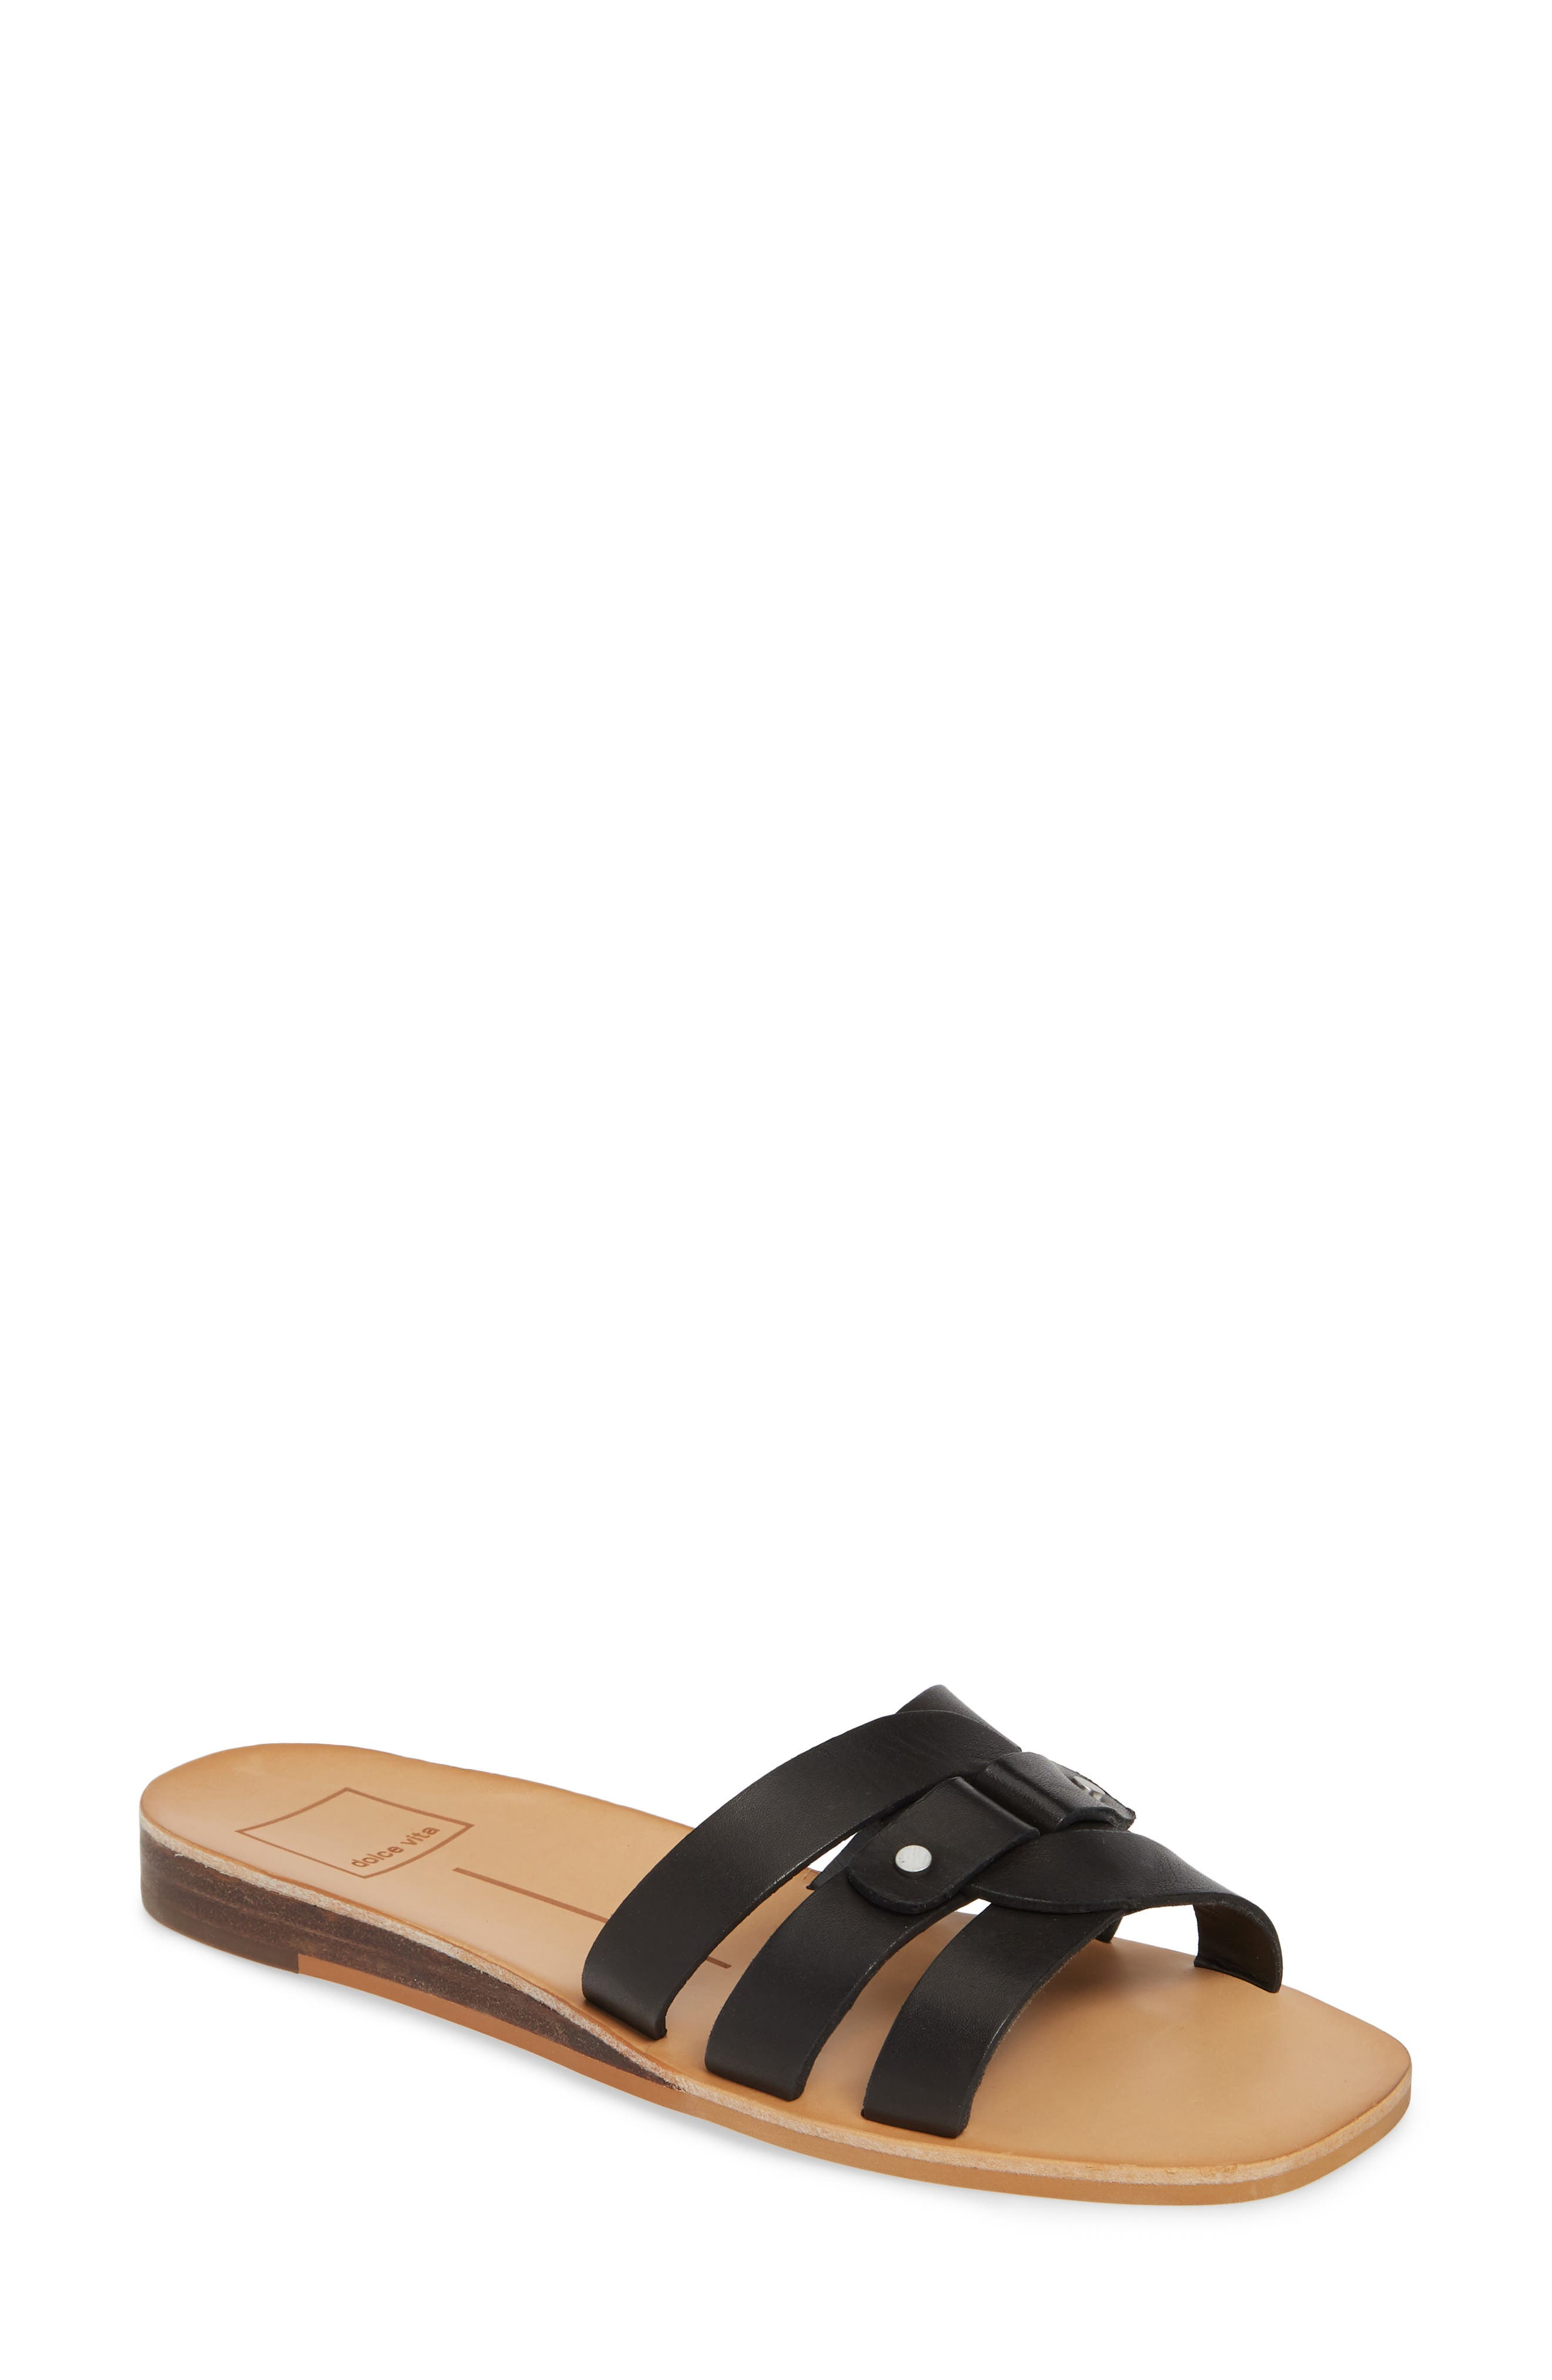 DOLCE VITA Cait Slide Sandal, Main, color, BLACK LEATHER